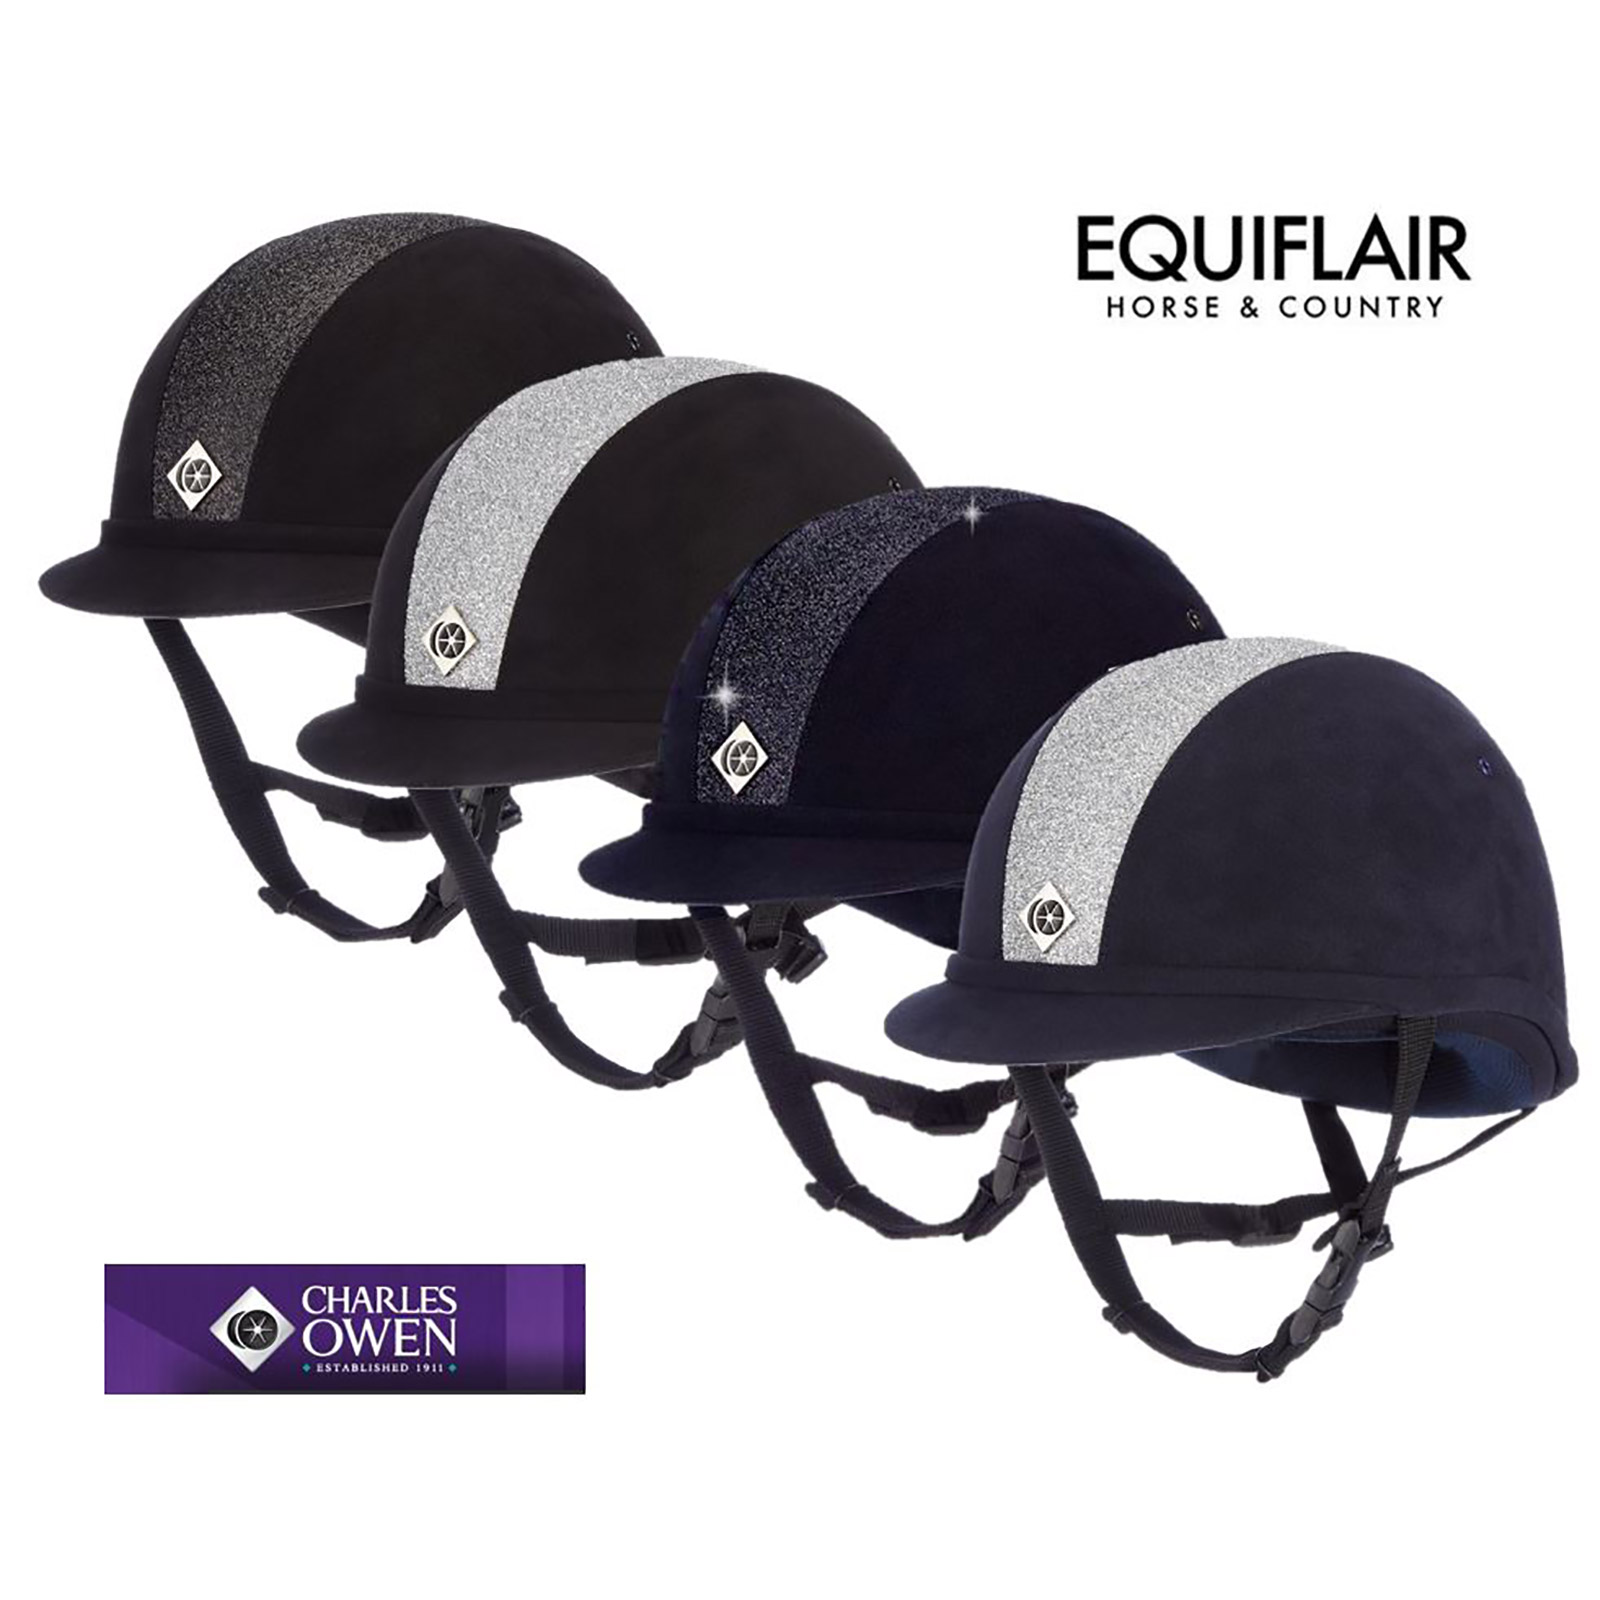 Charles-Owen-YR8-Sparkly-Riding-Helmet-Hat-PAS015-2011-VG1 miniature 4